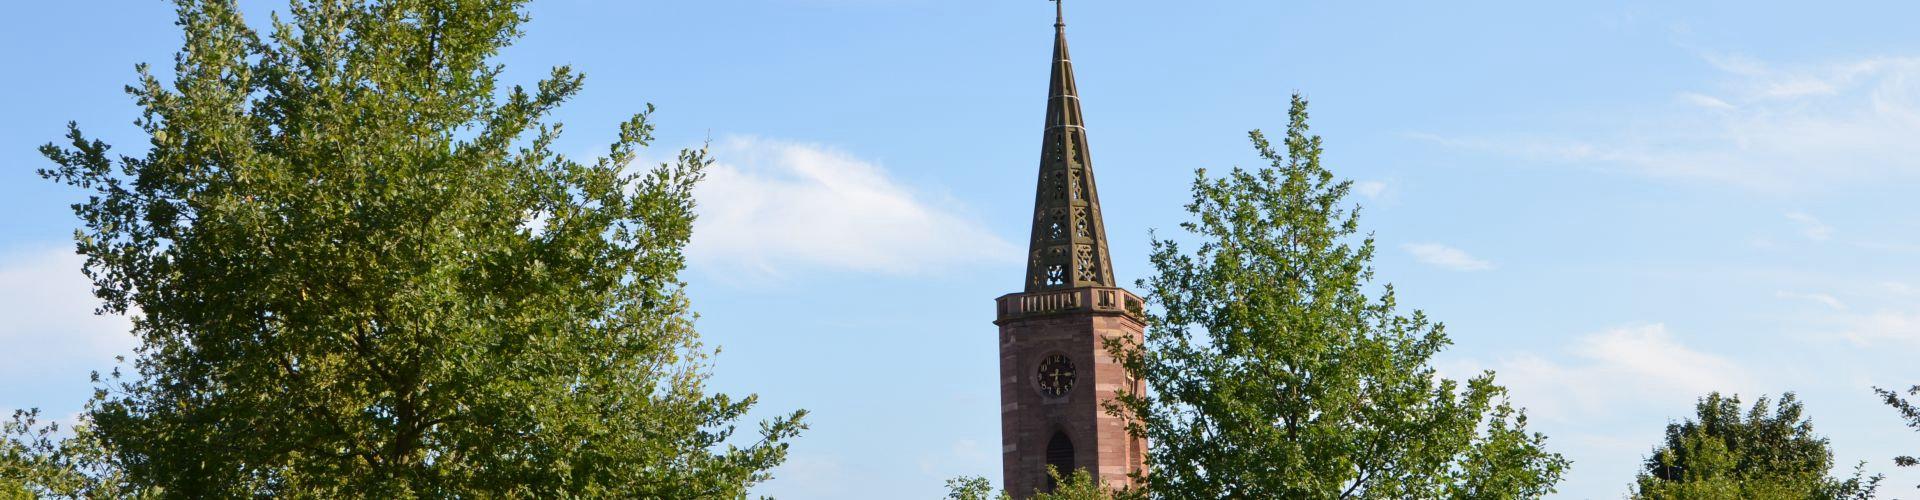 St. Martin Obergrombach / Quelle:  A. Konigorski